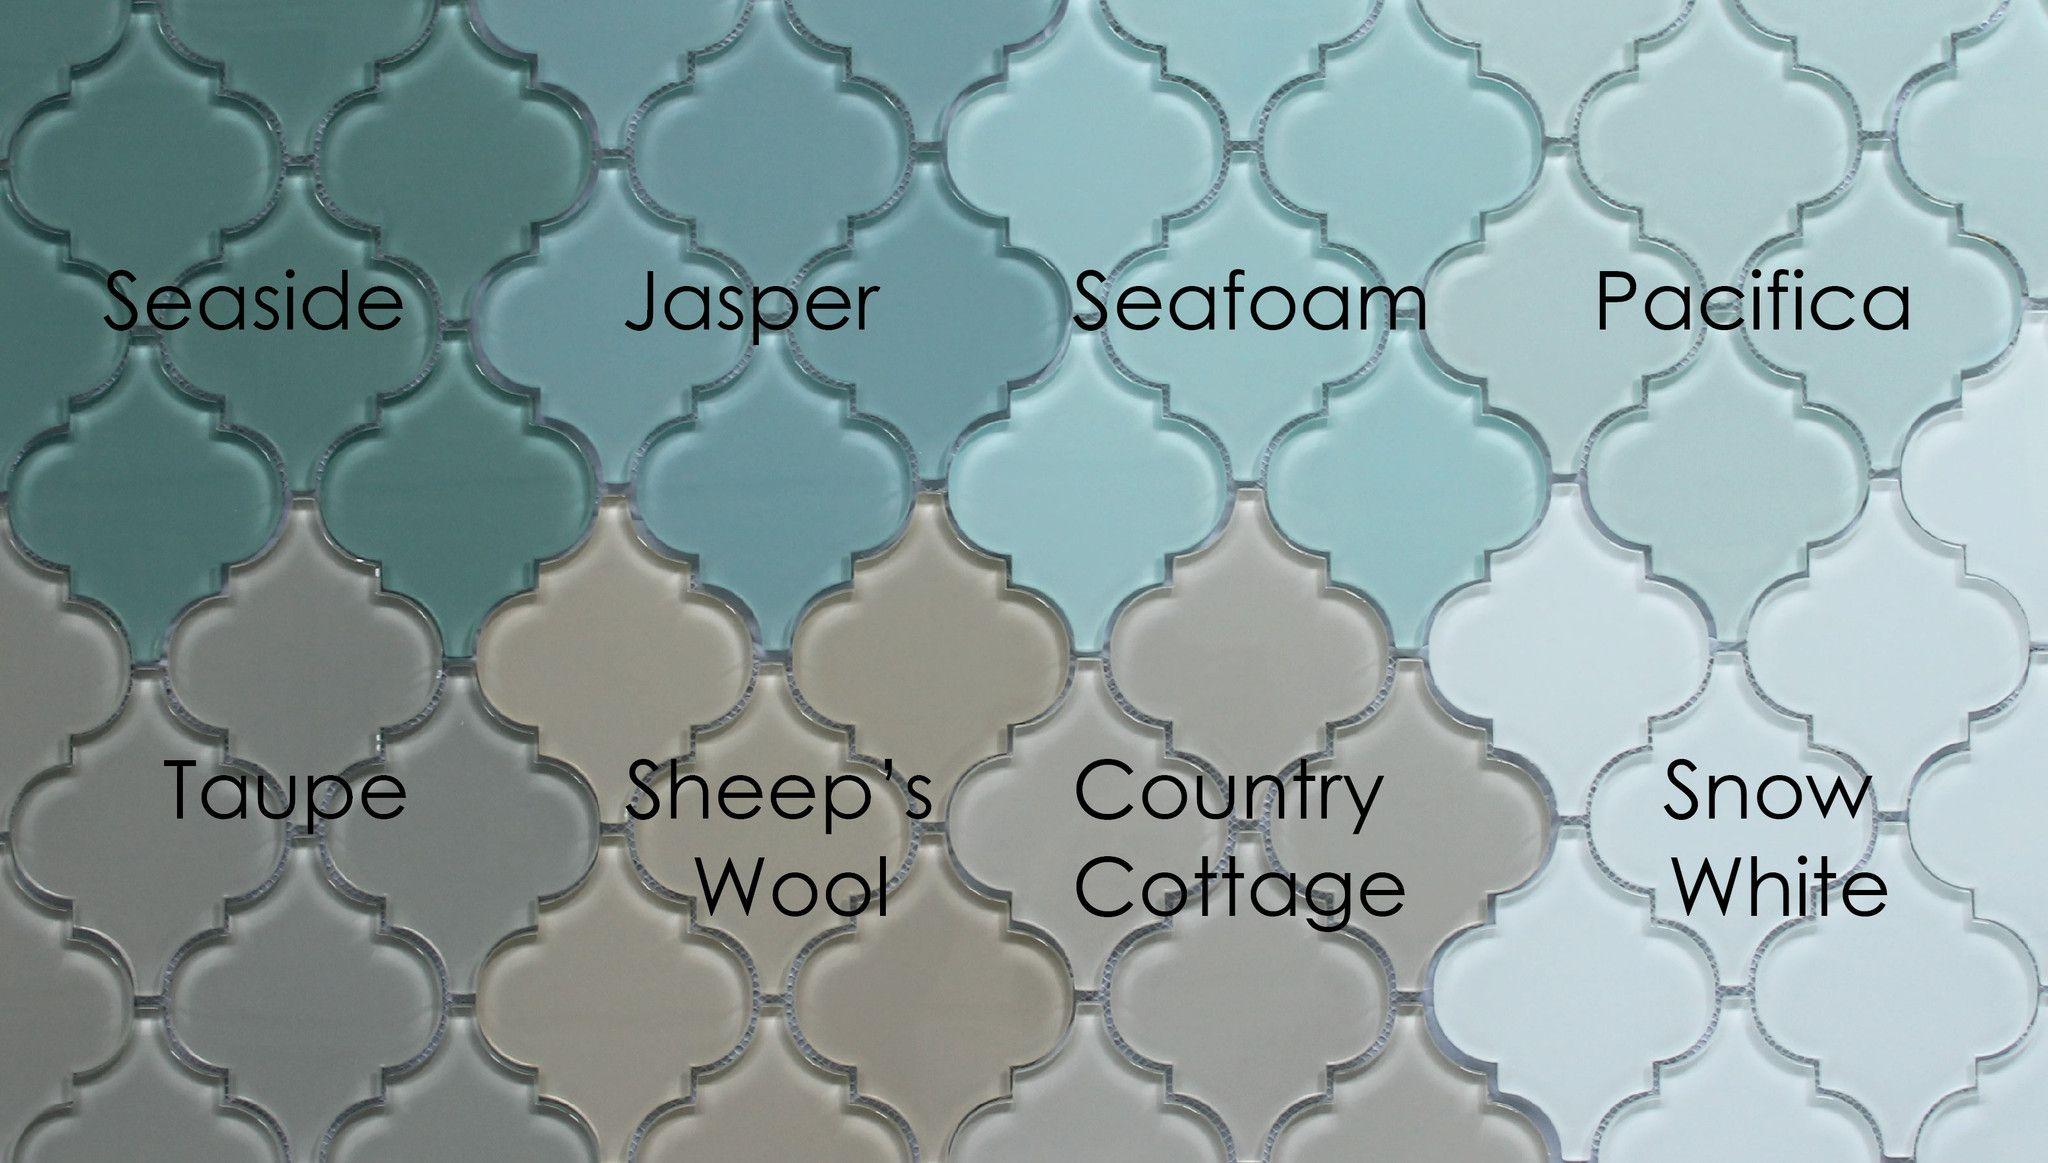 seaside arabesque glass mosaic tiles glass mosaic tiles seaside arabesque glass mosaic tiles